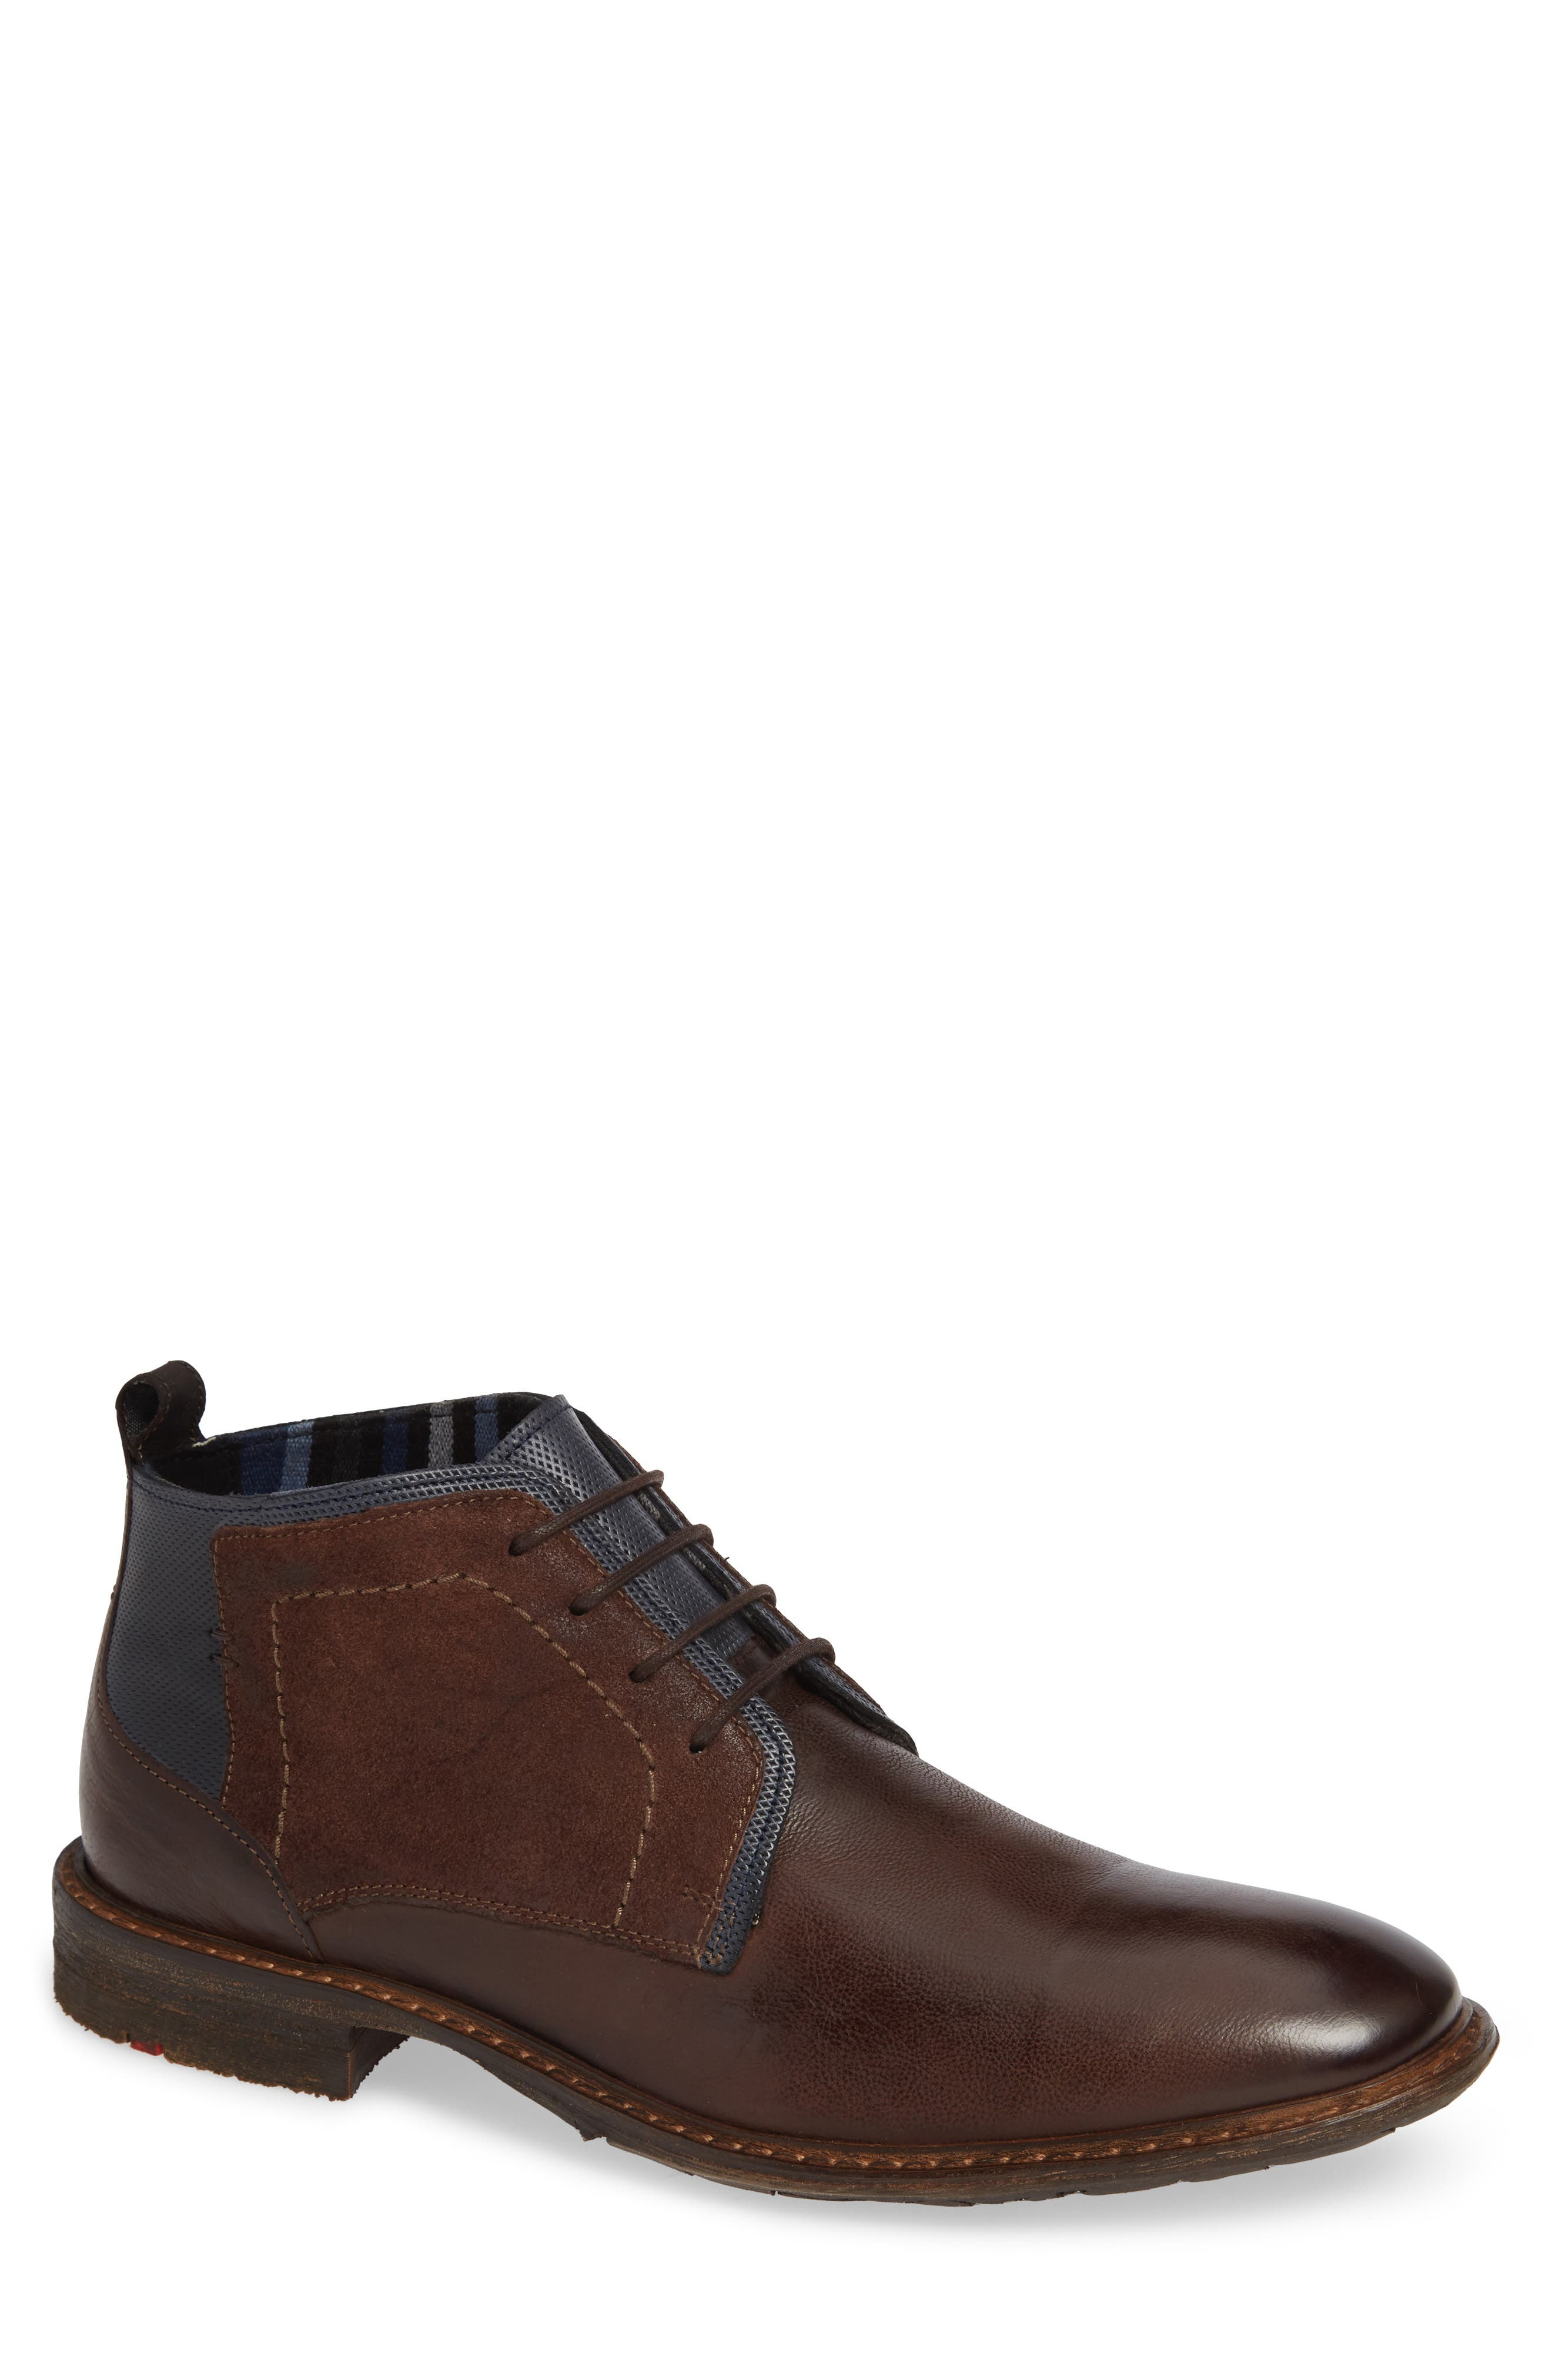 Dingo Plain Toe Boot,                         Main,                         color, TOBACCO LEATHER